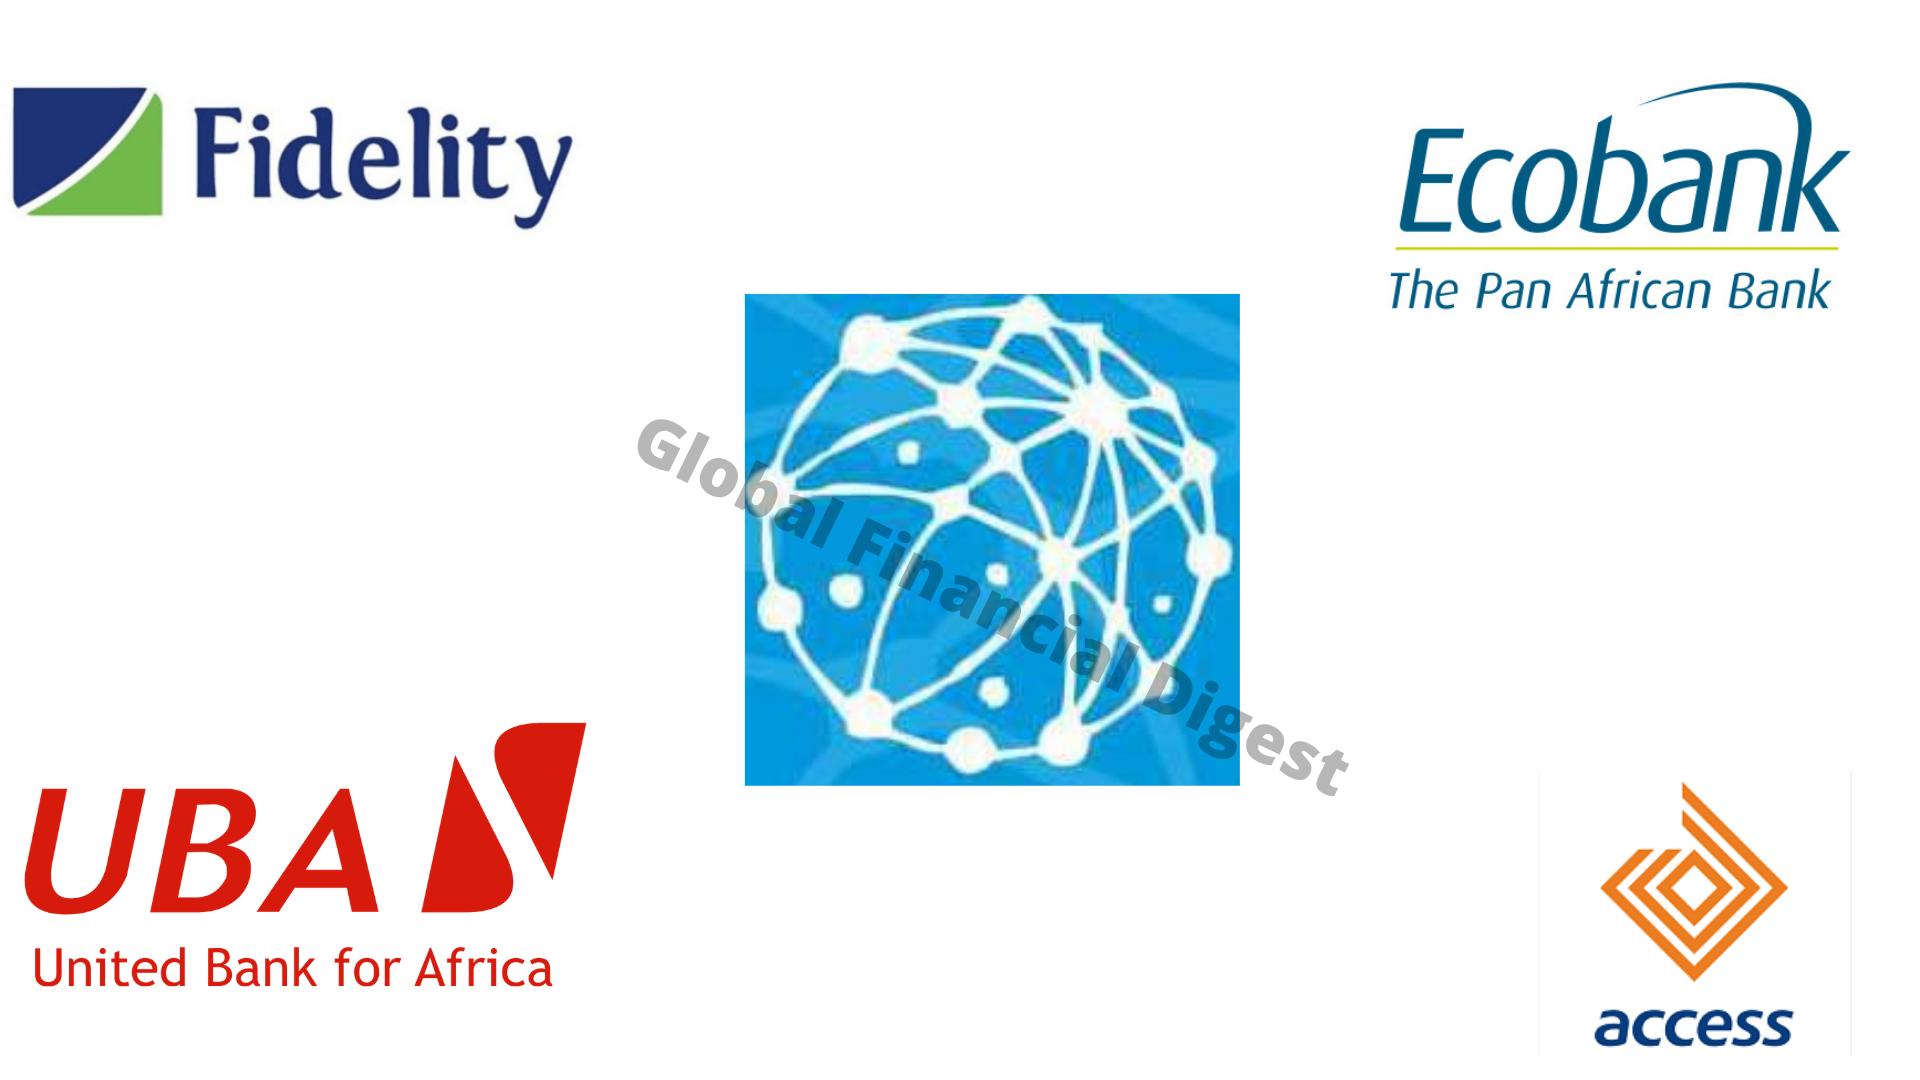 Global Financial Digest 2